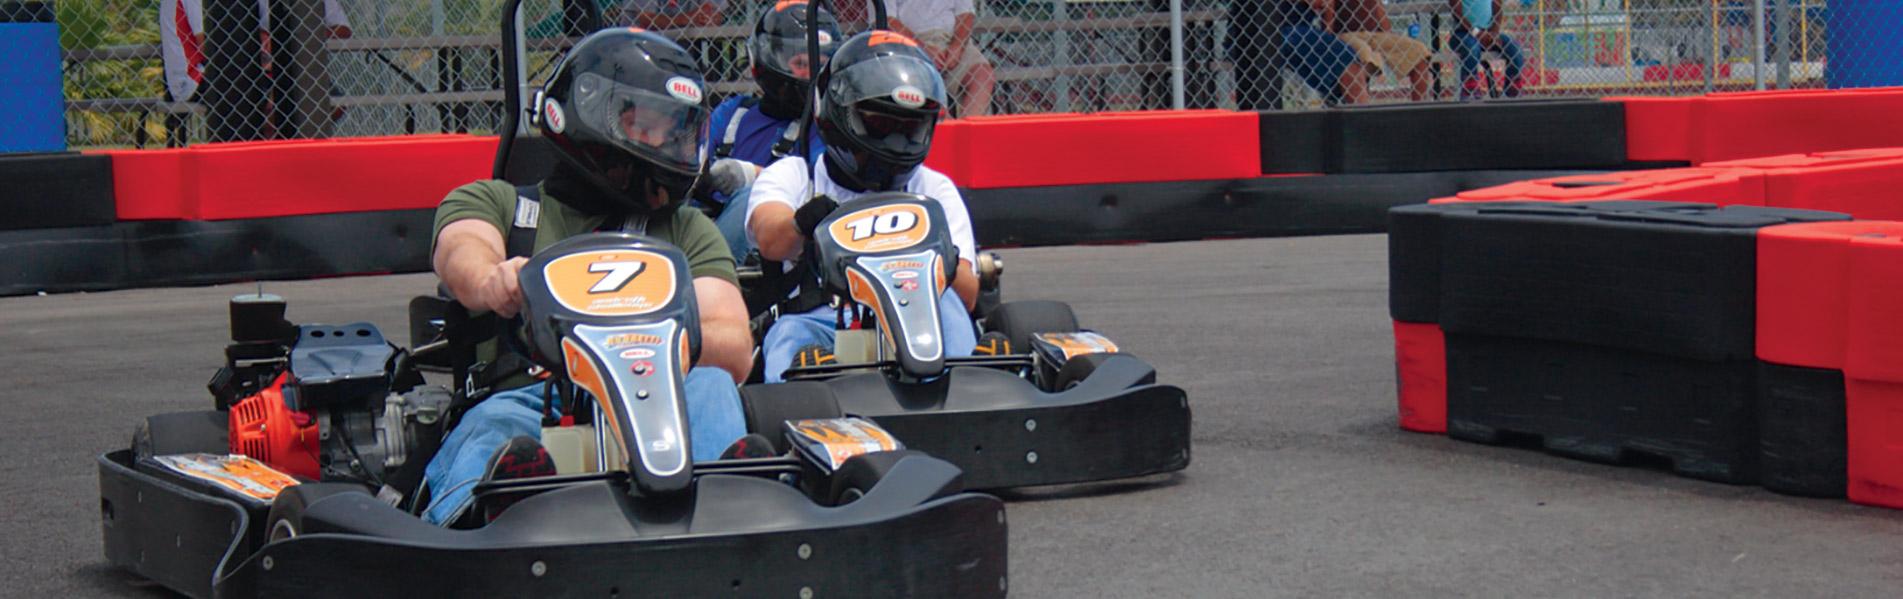 Go Kart Racing Melbourne Florida